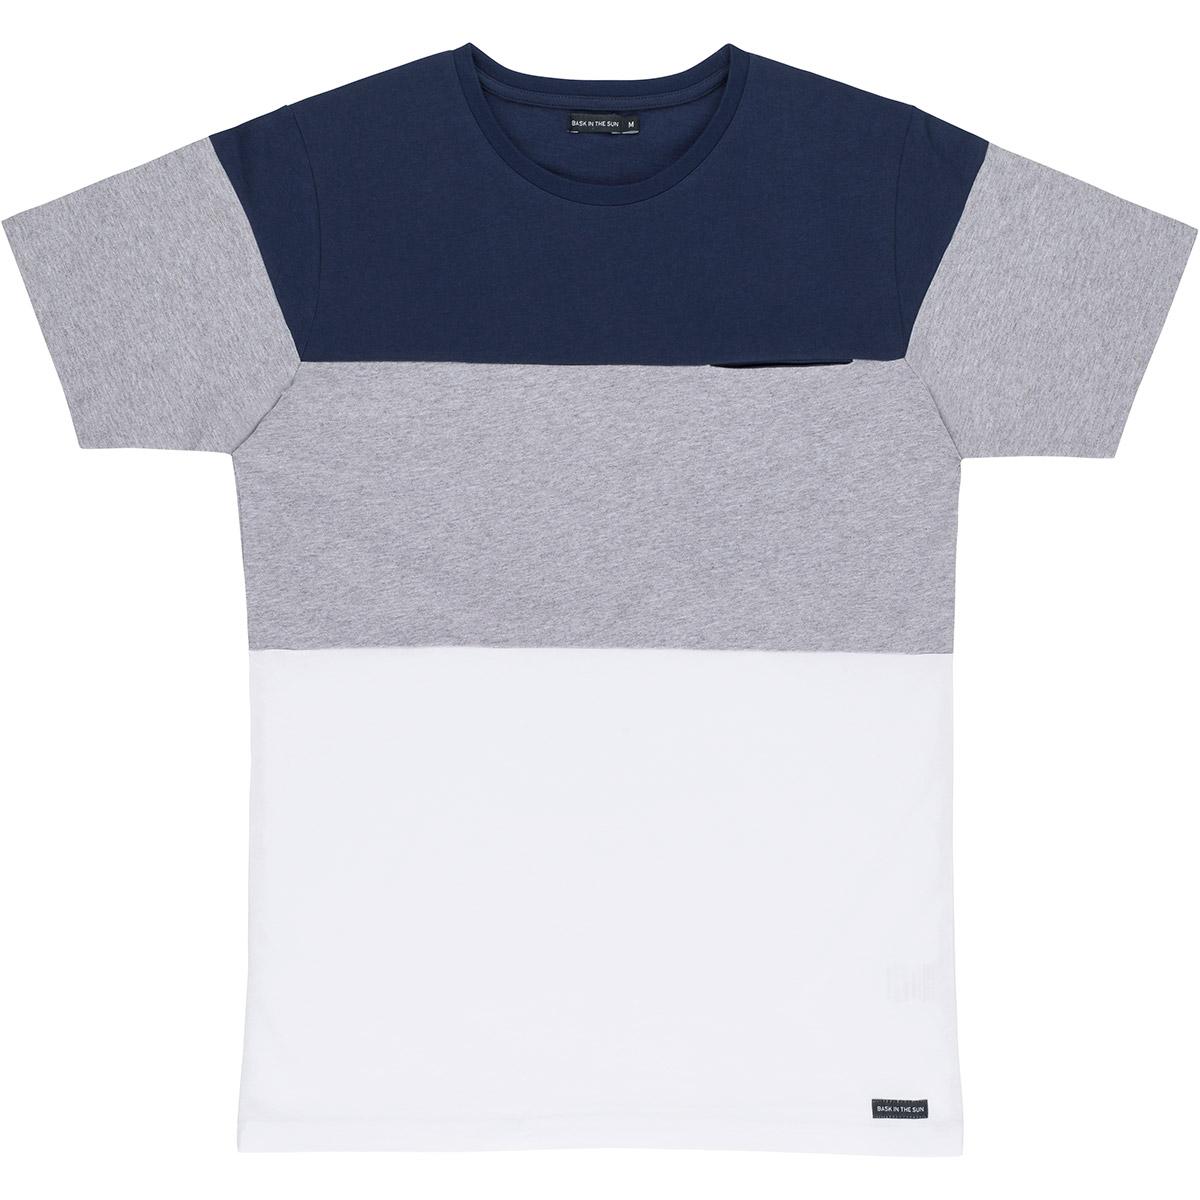 T-shirt en coton bio teofilo - Bask in the Sun num 0